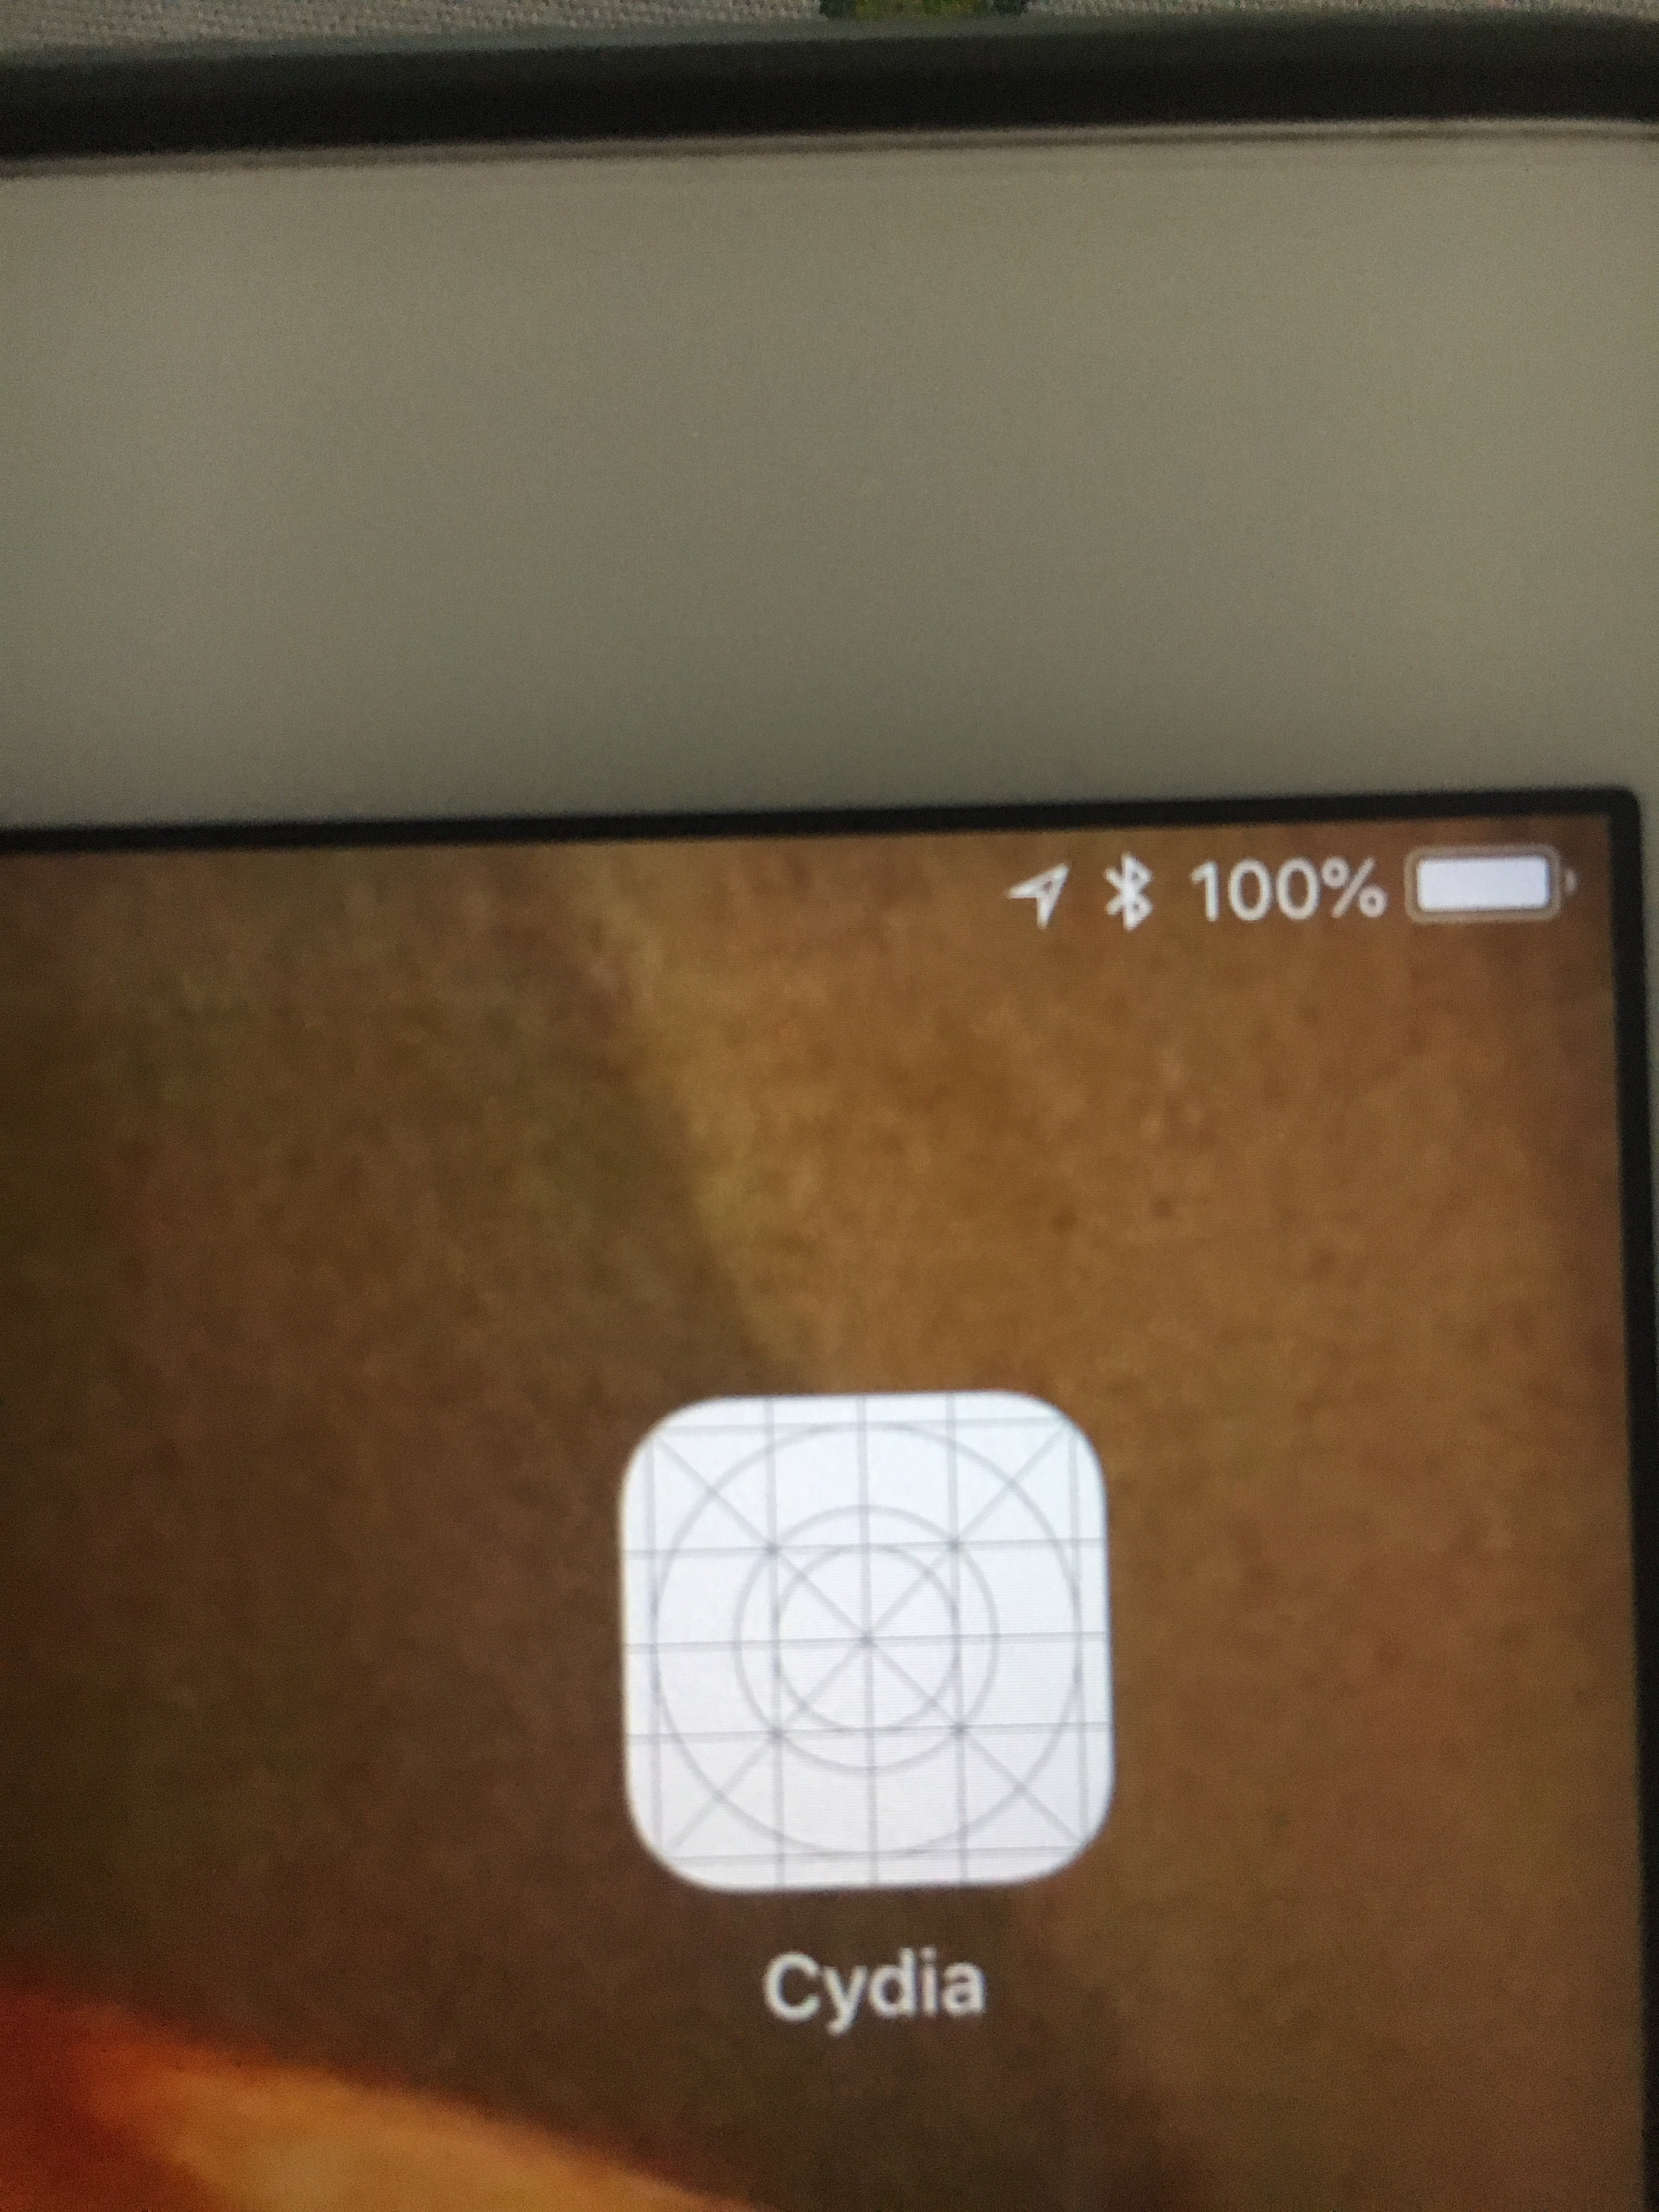 iPad - My attempt at jailbreaking 11 3 1 | MacRumors Forums